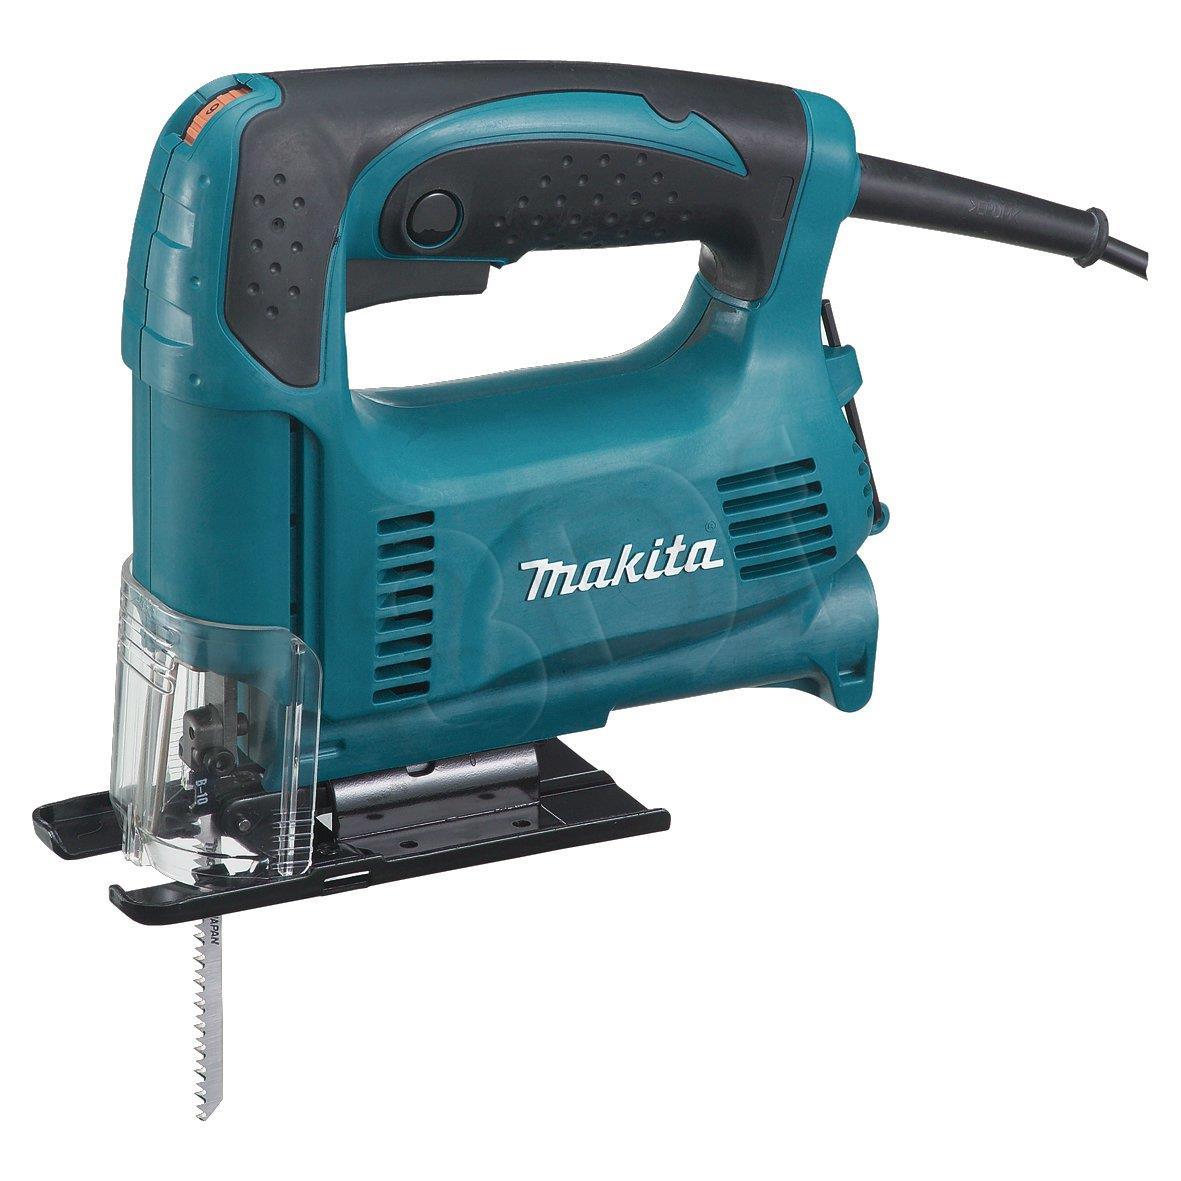 Makita 4326 Elektriskais zāģis